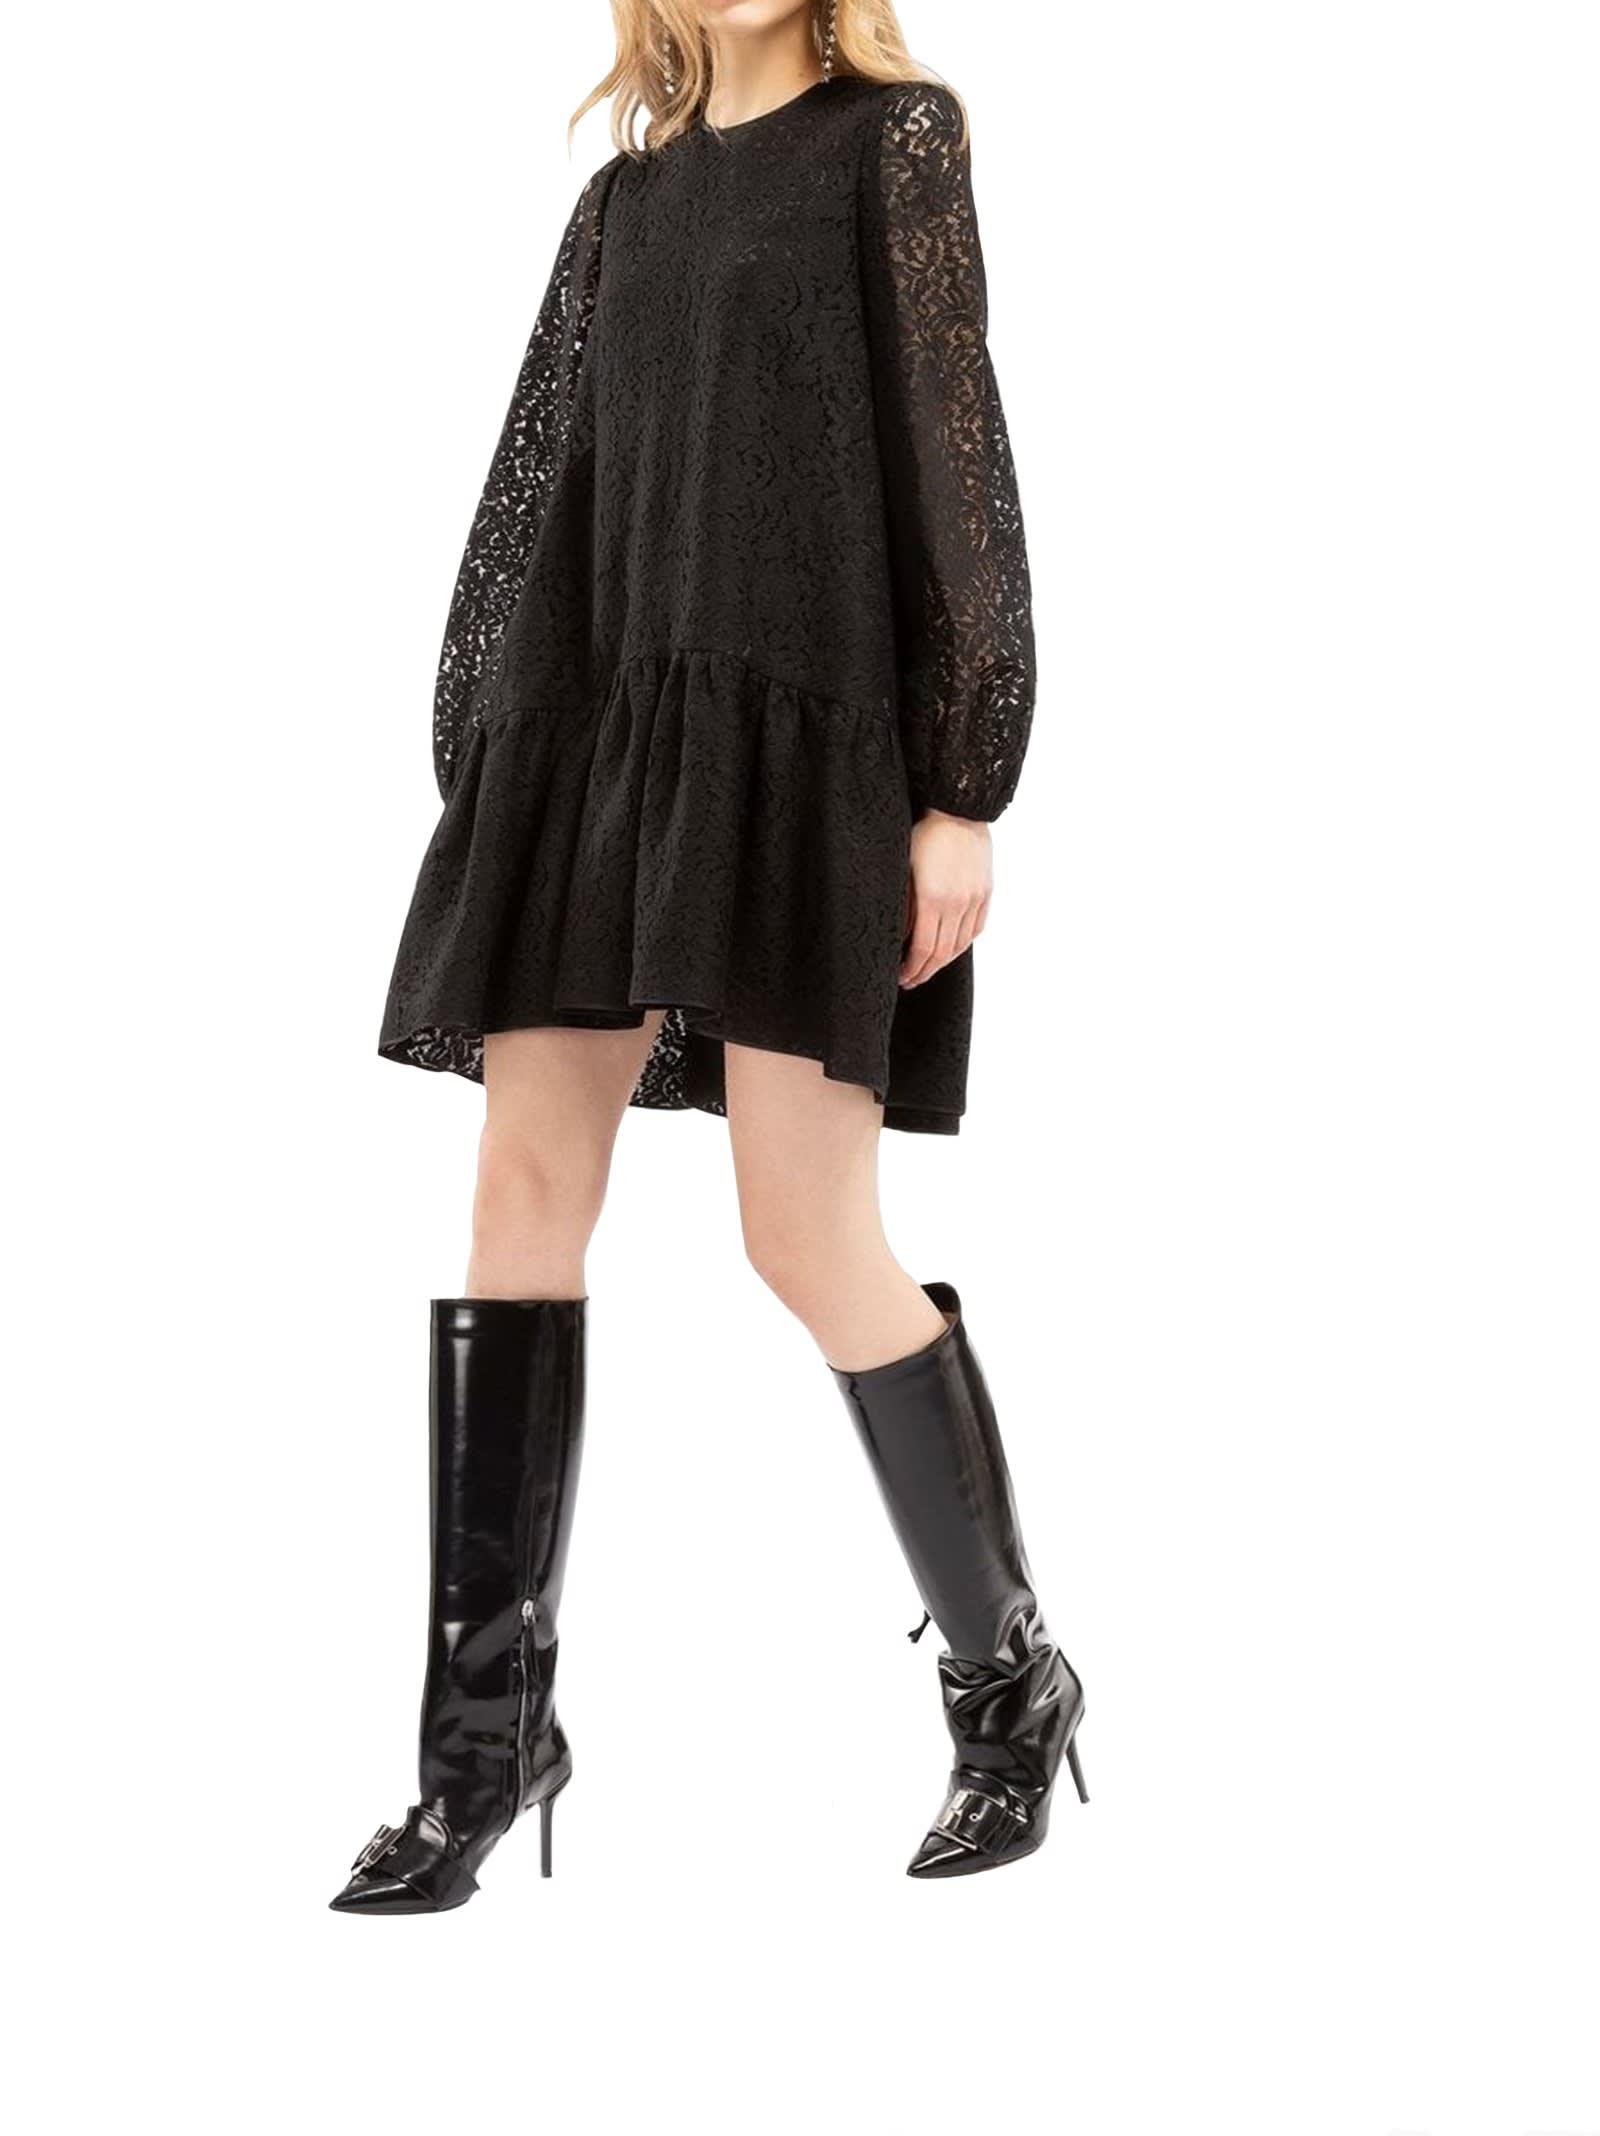 N°21 Womans Black Cotton Dress